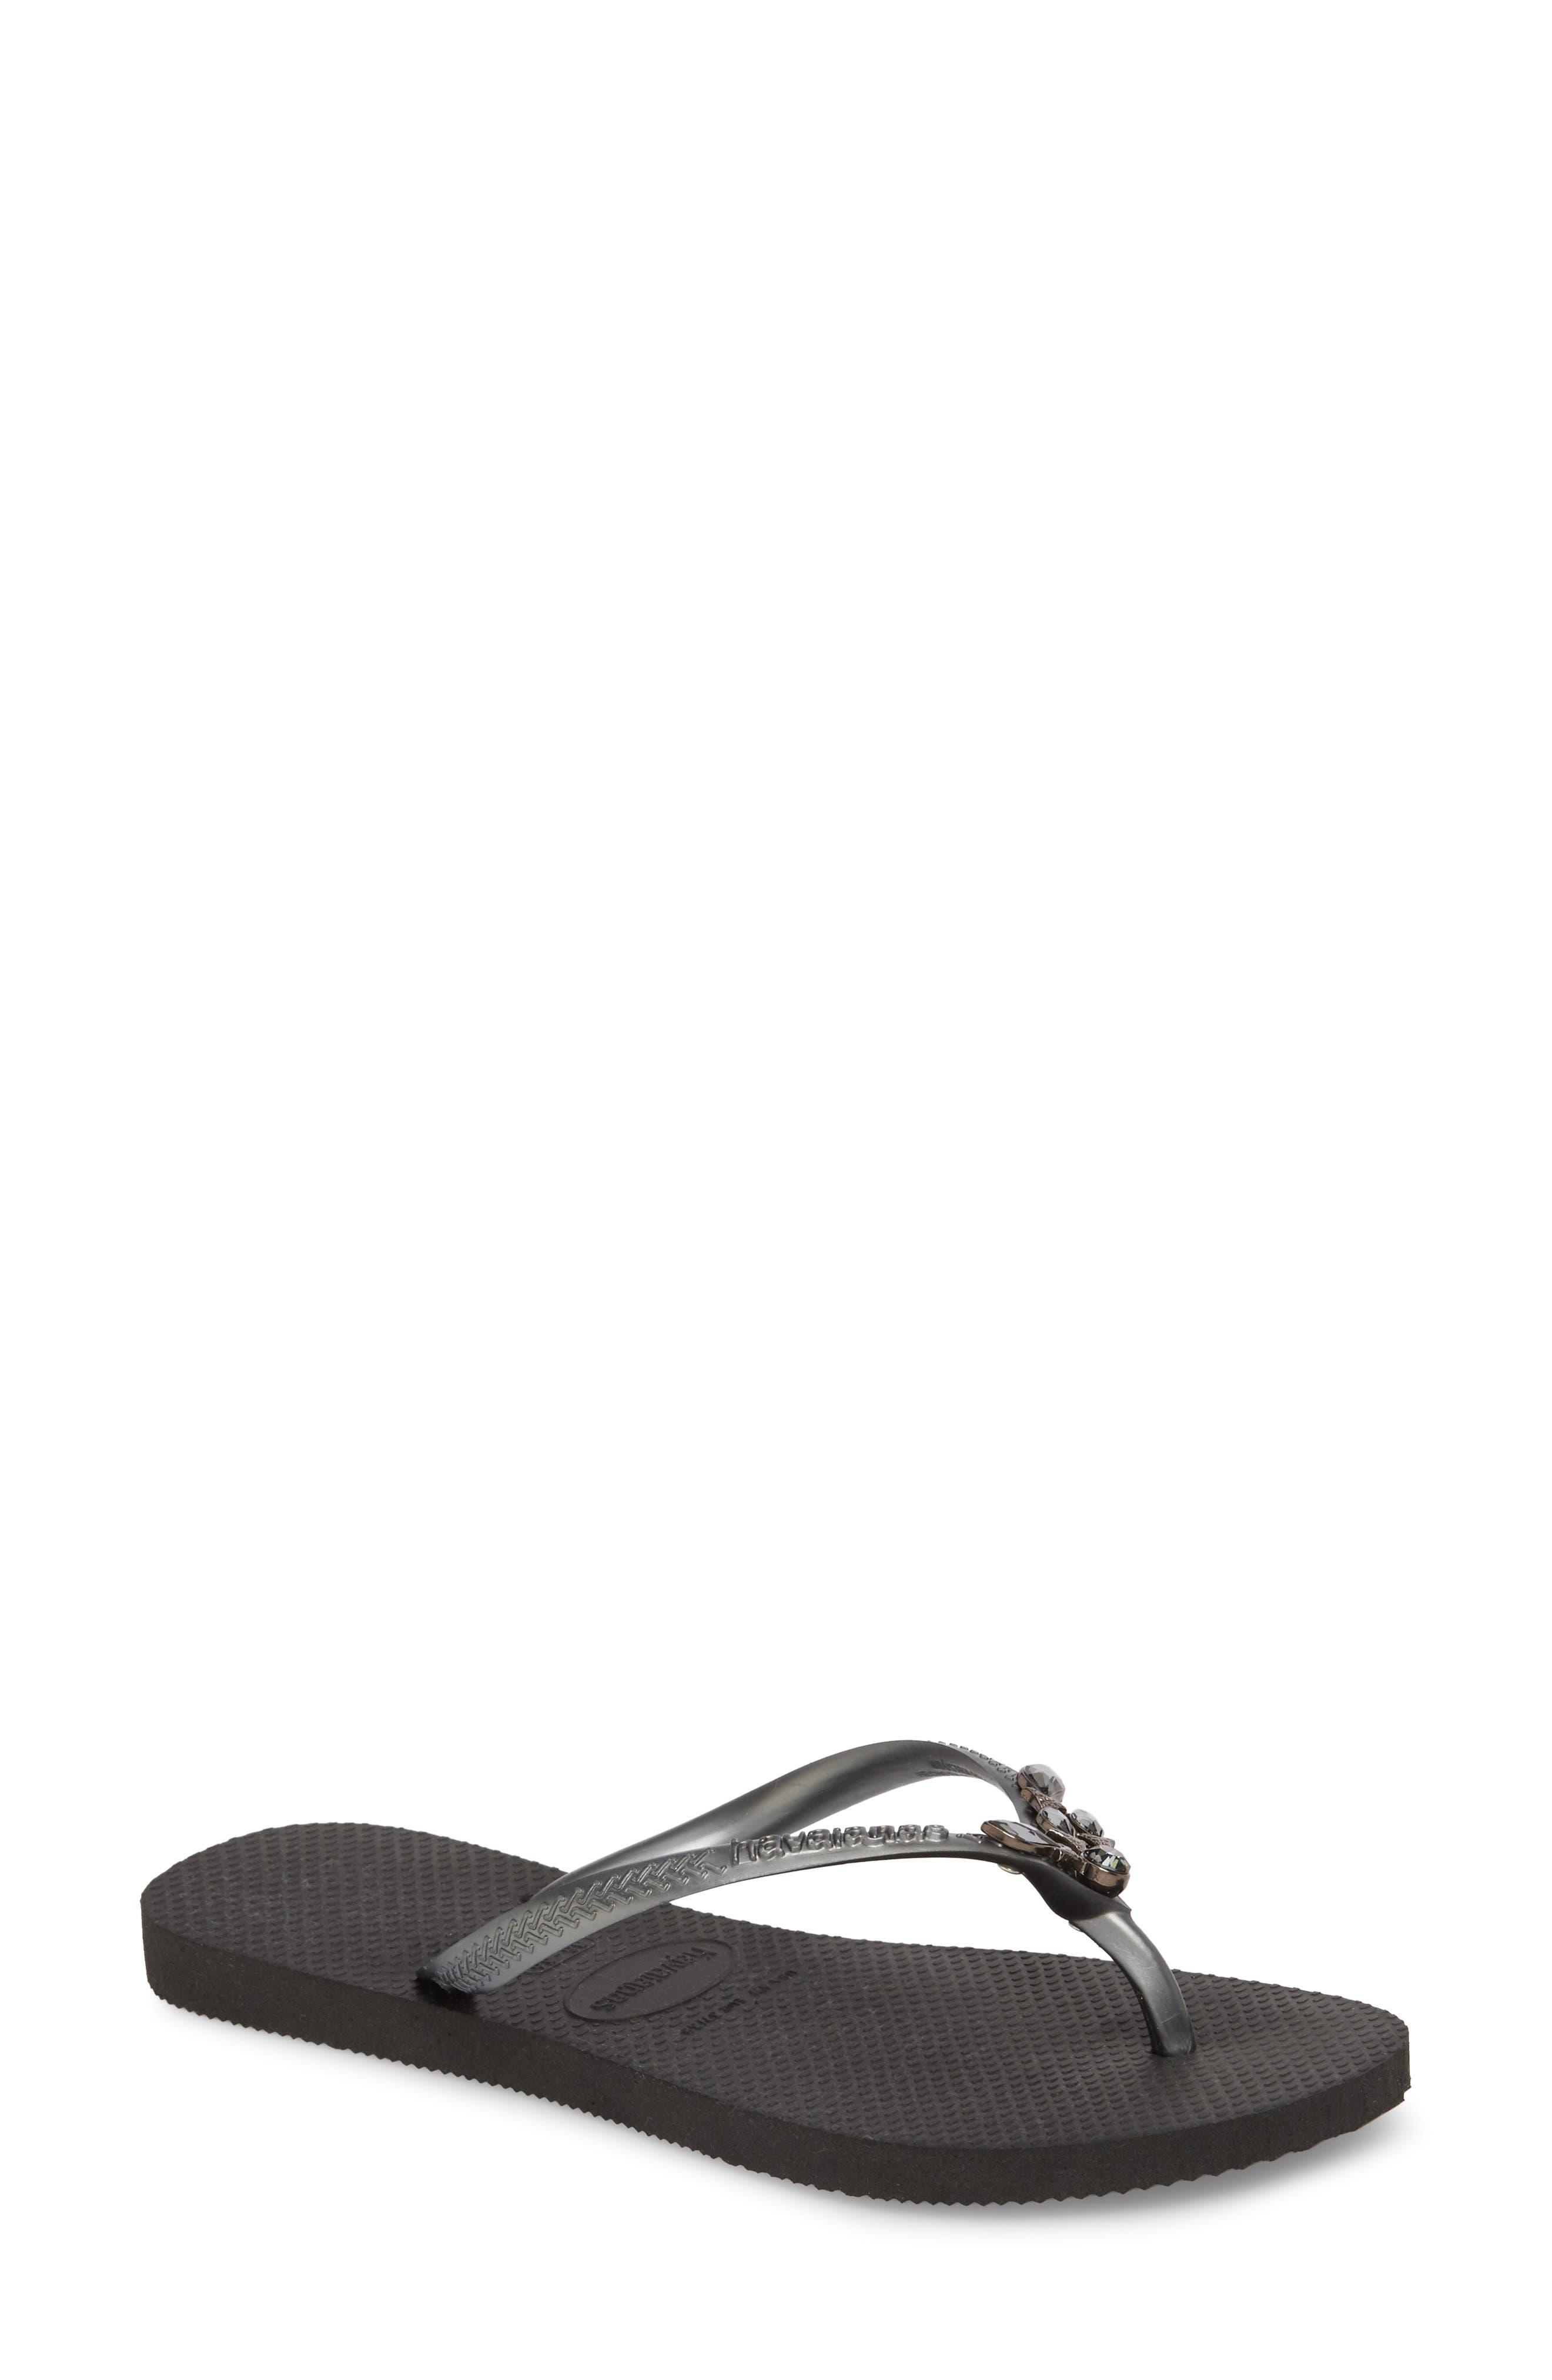 Slim Lux Flip Flop,                         Main,                         color, Black/ Black